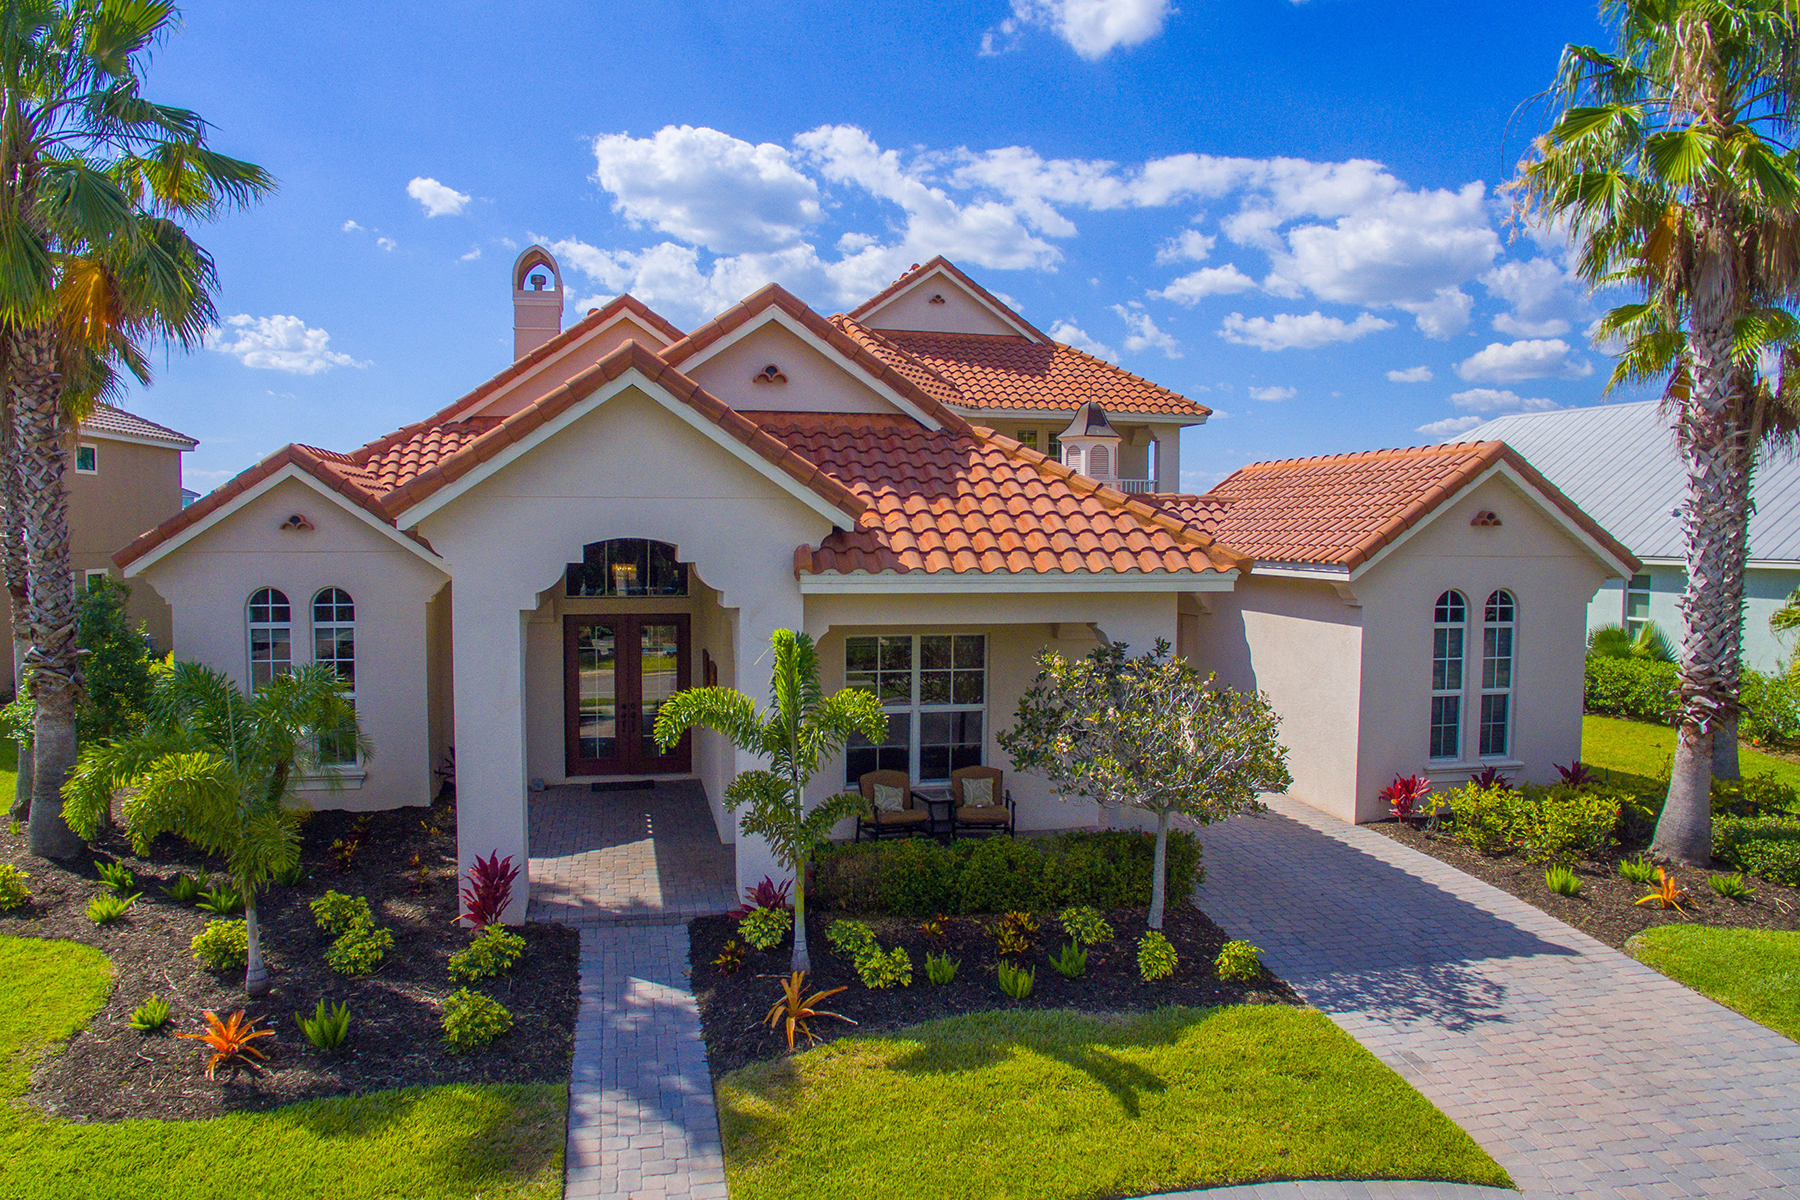 独户住宅 为 销售 在 THE RESERVE AT HARBOUR WALK 548 Fore Dr 布雷登顿, 佛罗里达州, 34208 美国